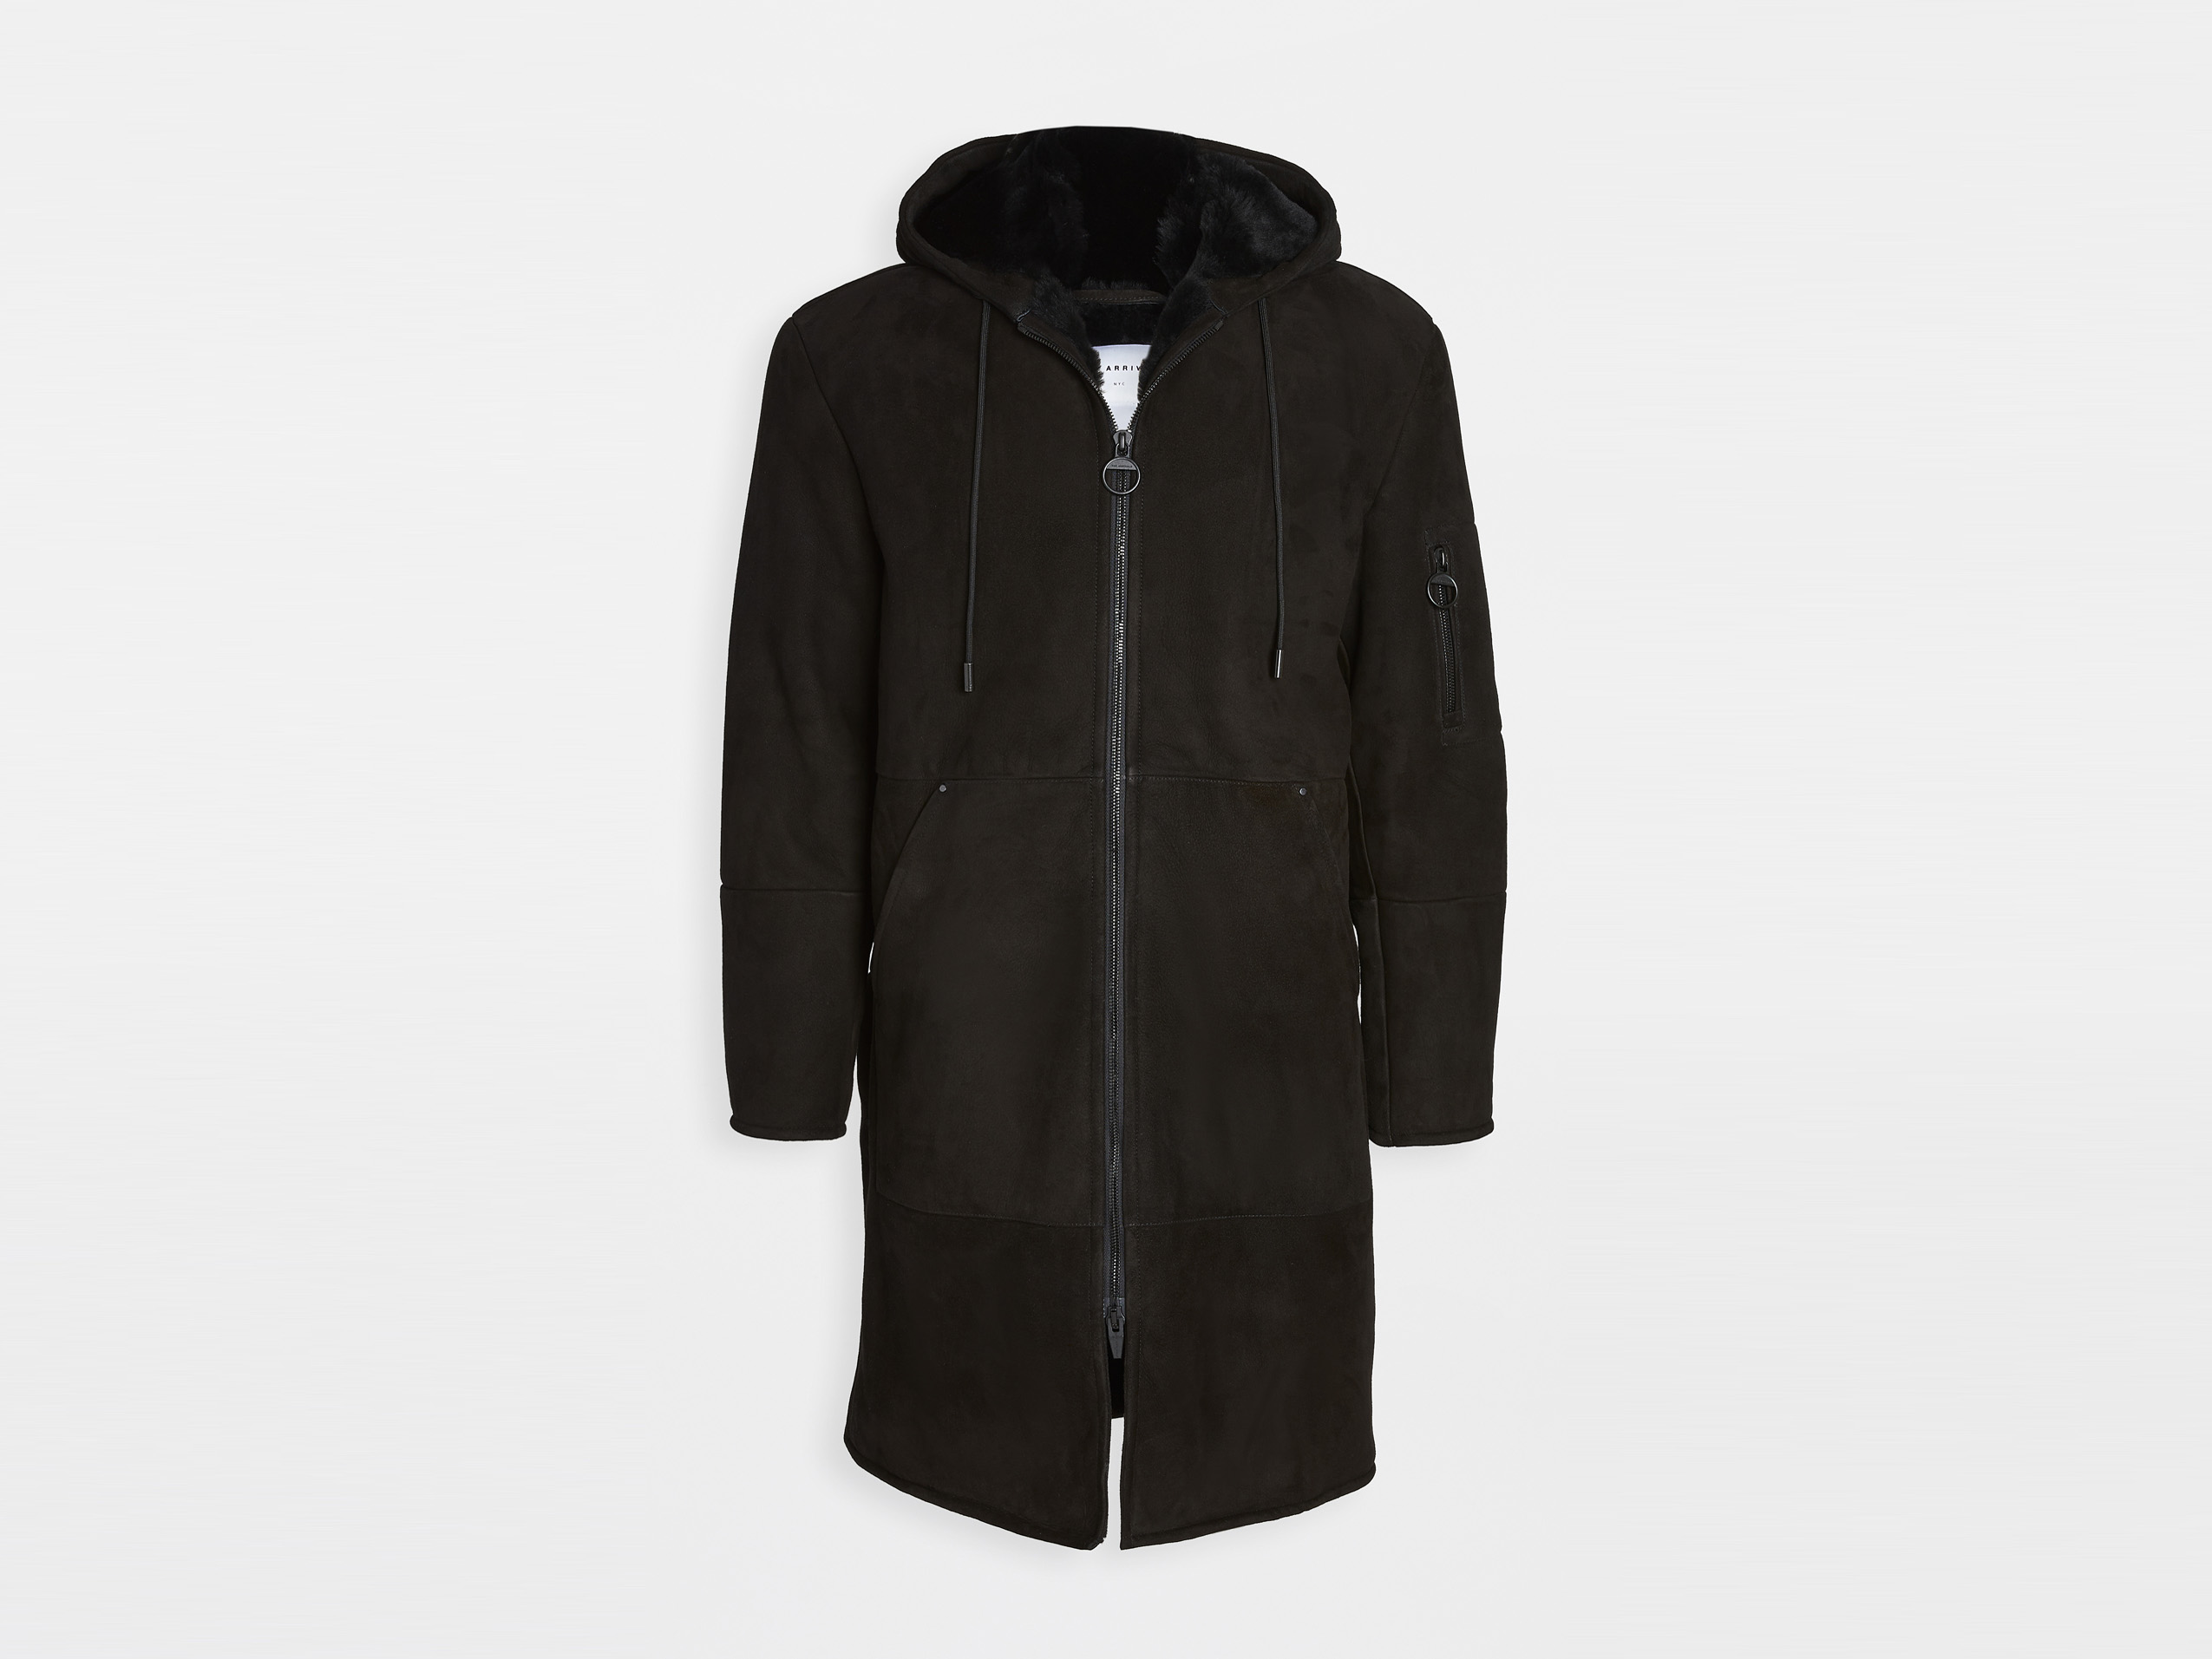 Best Men's Winter Jackets - The Arrivals Shearling Hooded Coat